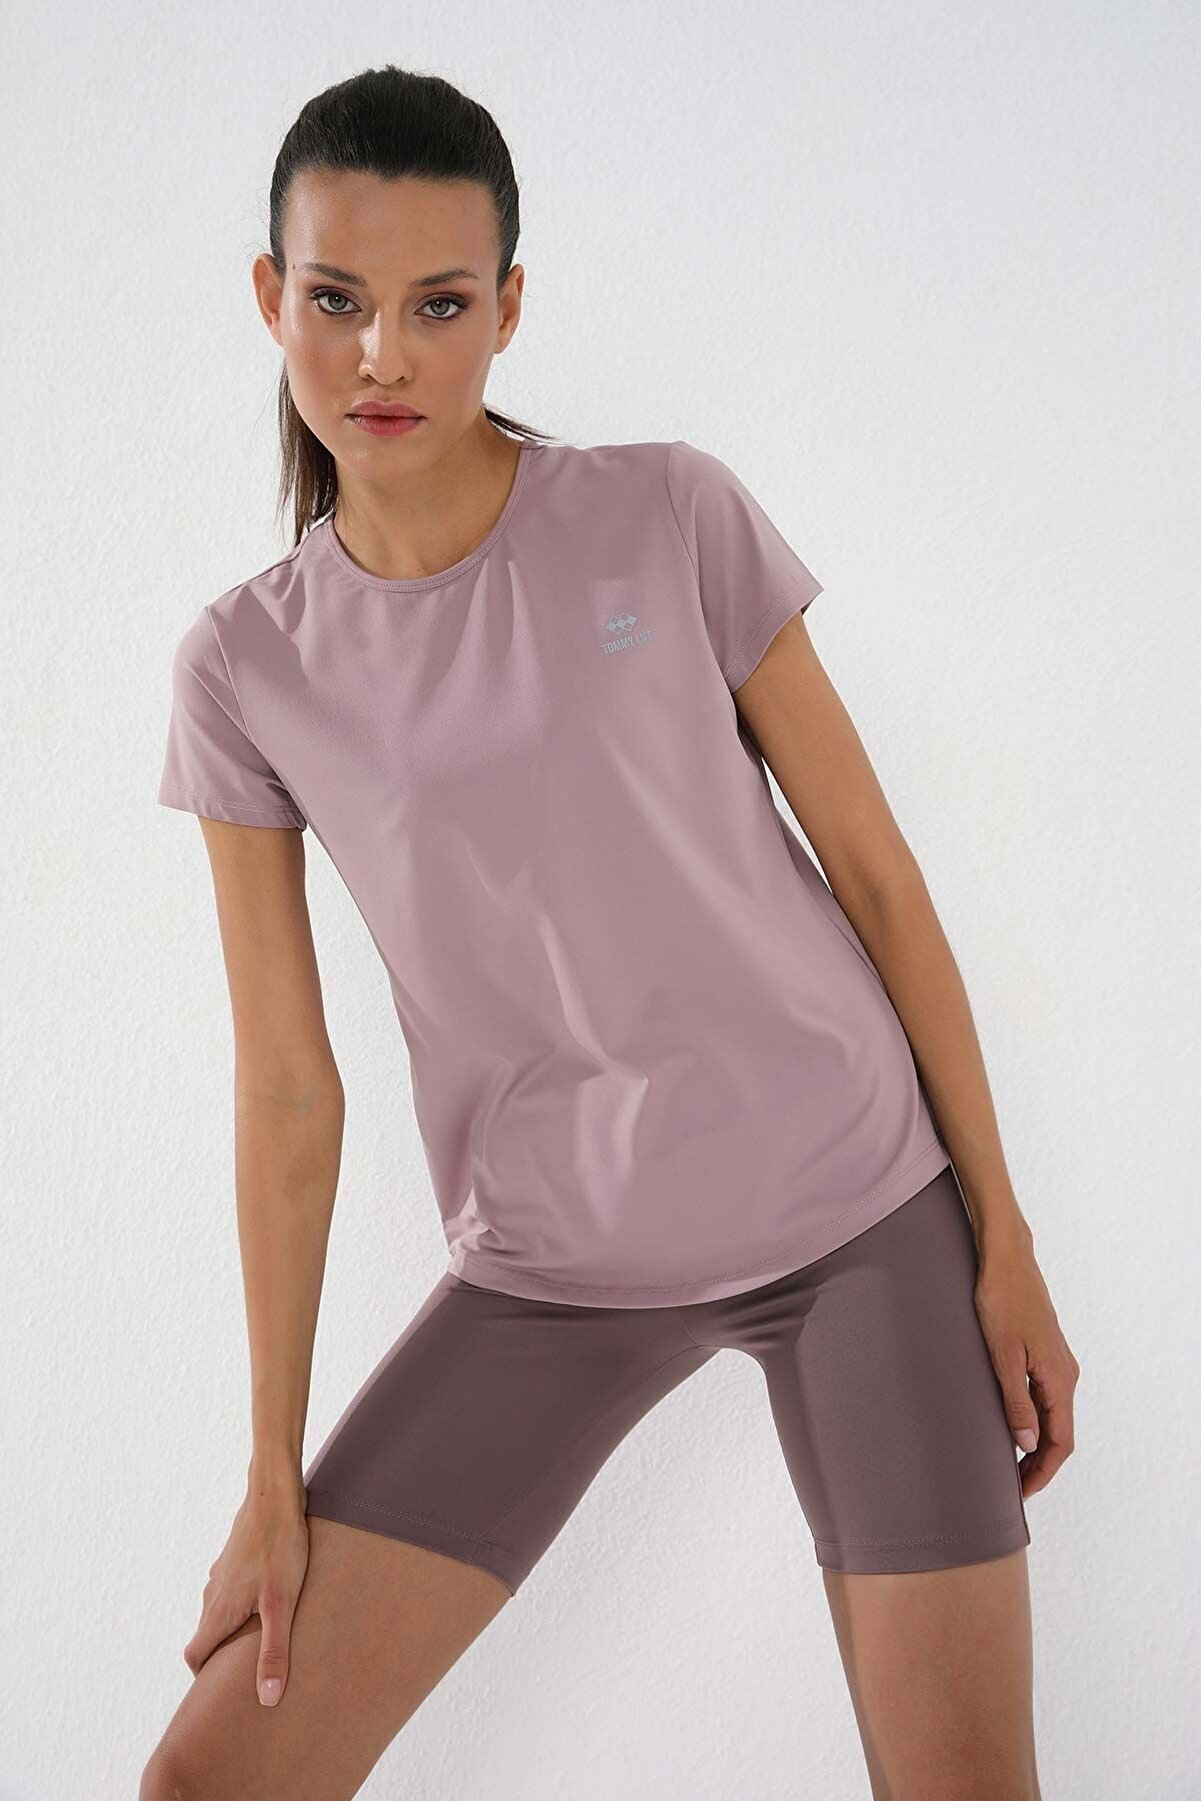 Tommy Life Gül Kurusu Kadın Basic Kısa Kol Standart Kalıp O Yaka T-shirt - 97144